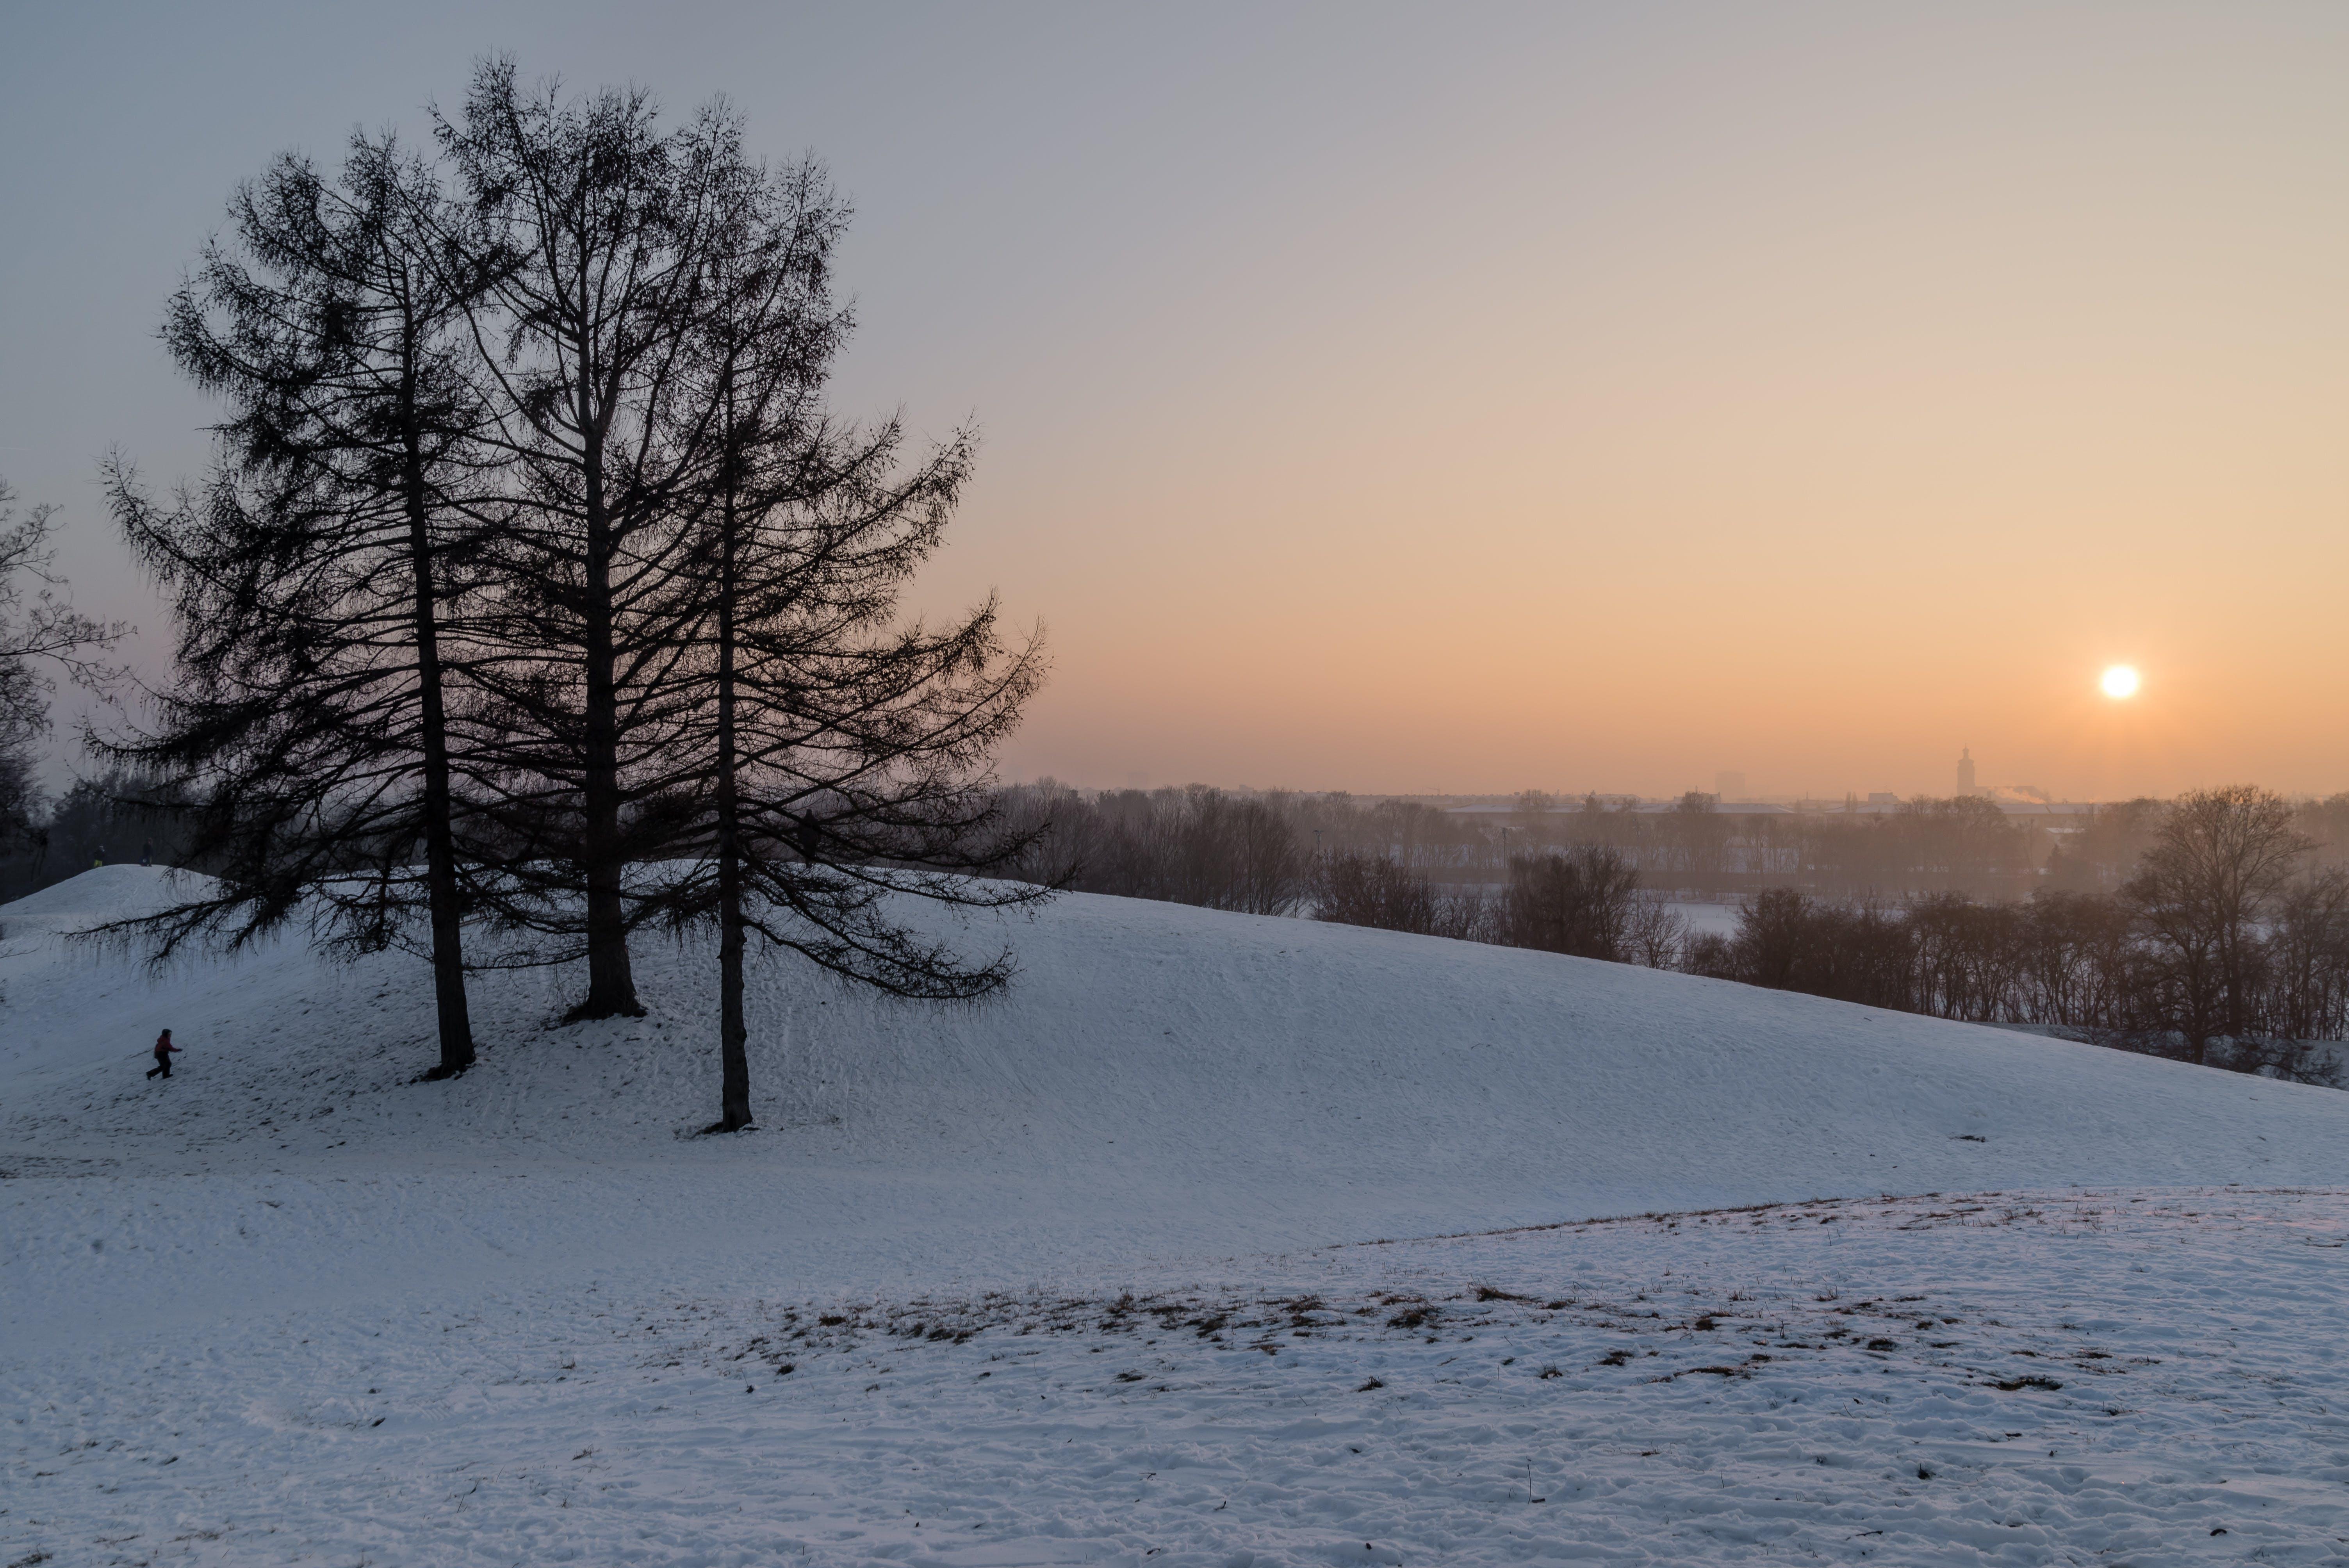 Free stock photo of snow, city, landscape, nature